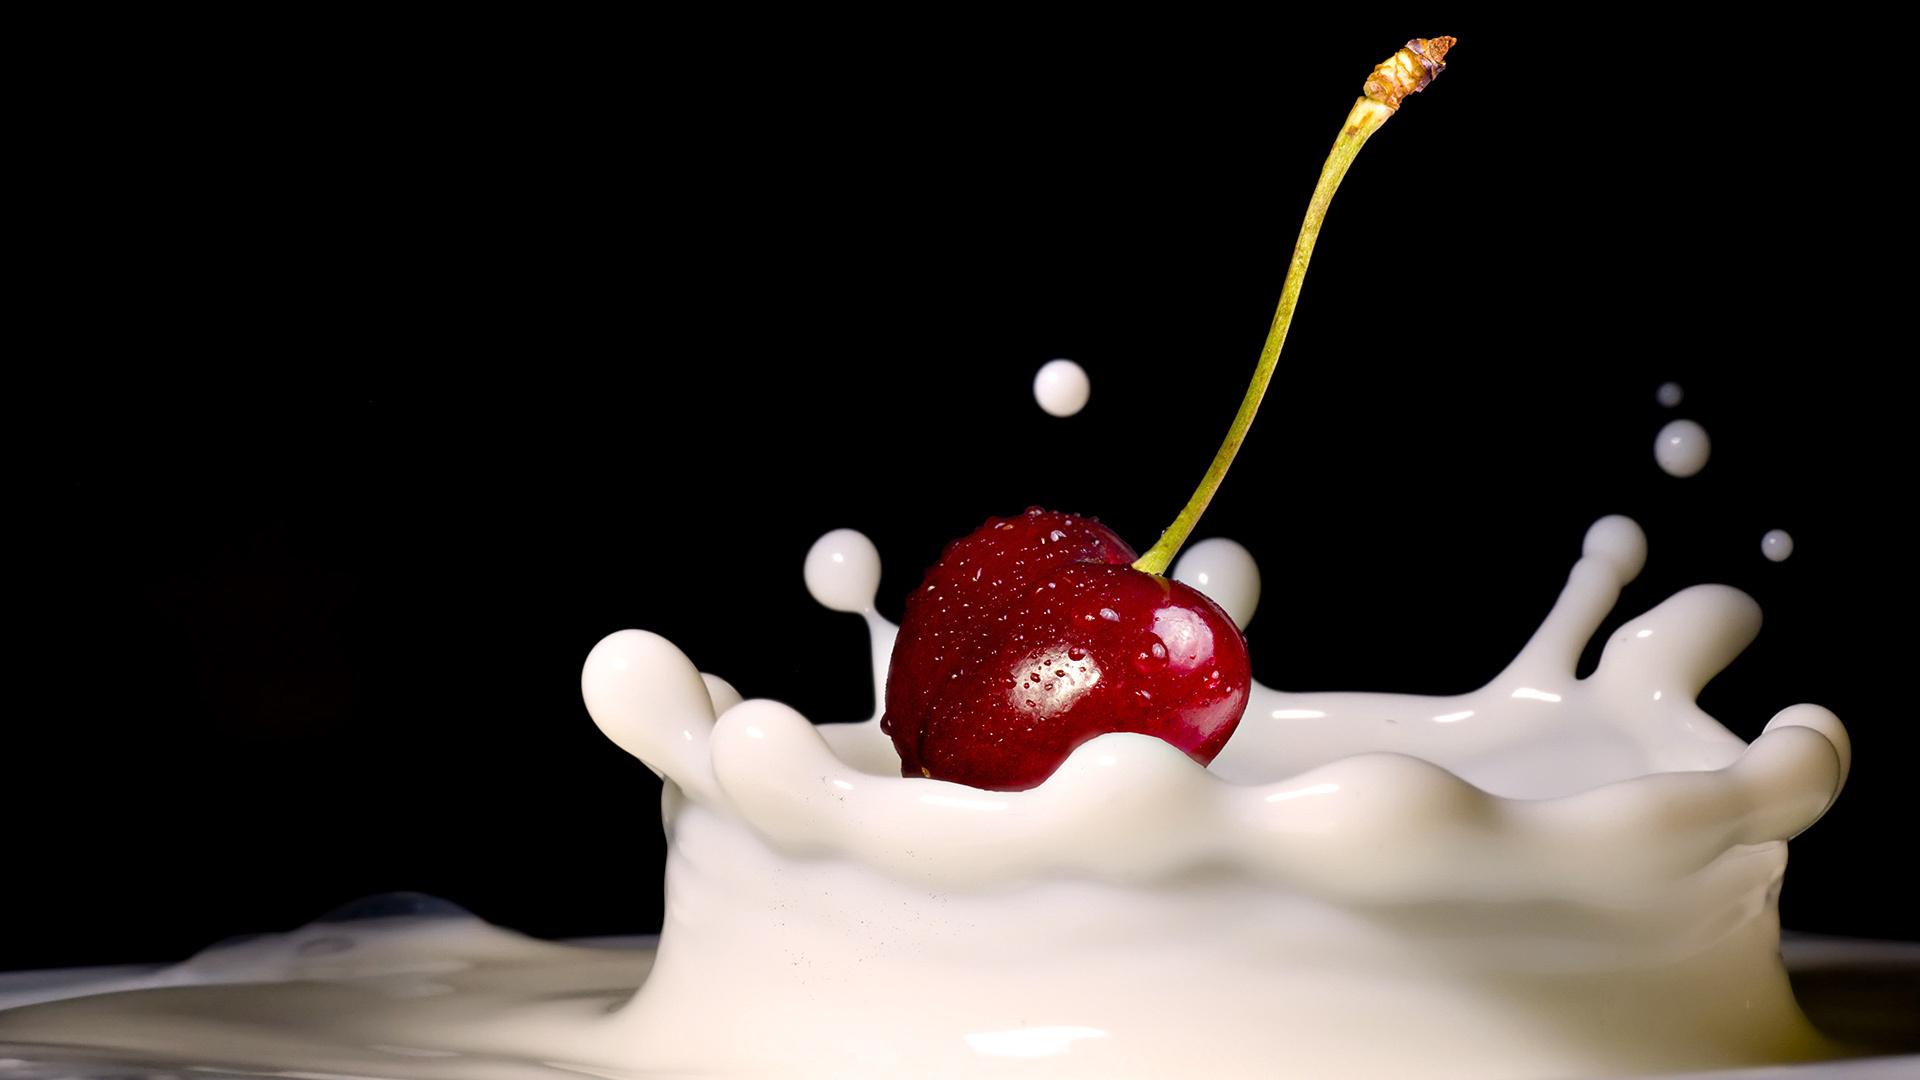 вишенка в сливках, вишня, фото, обои на рабочий стол